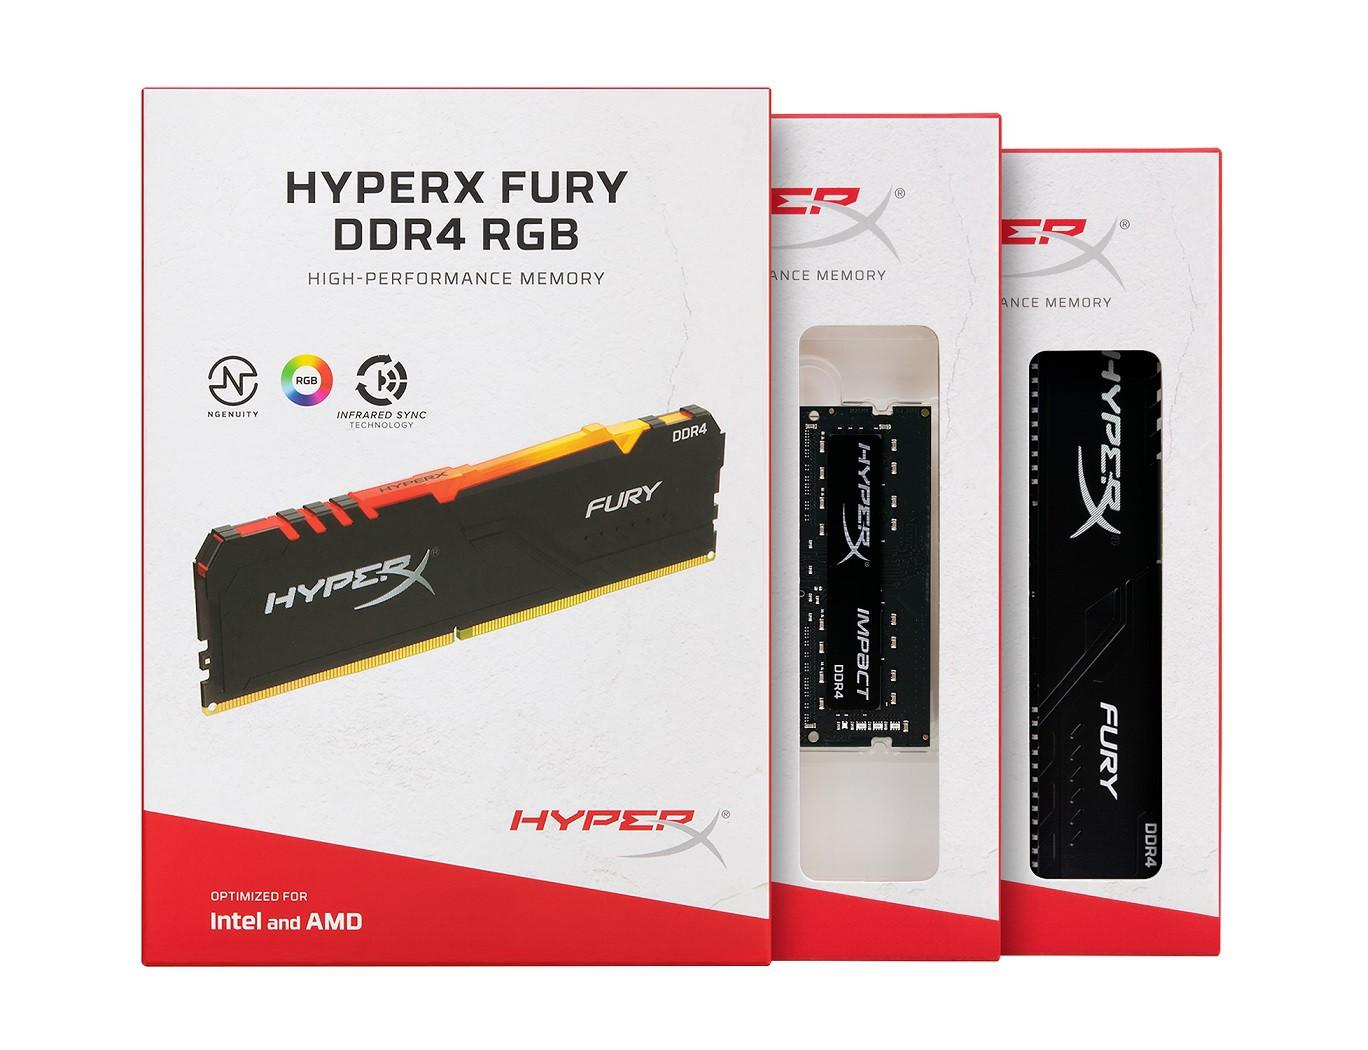 https://www.coolaler.com.tw/image/news/20/07/HyperX_DDR4_1.jpg